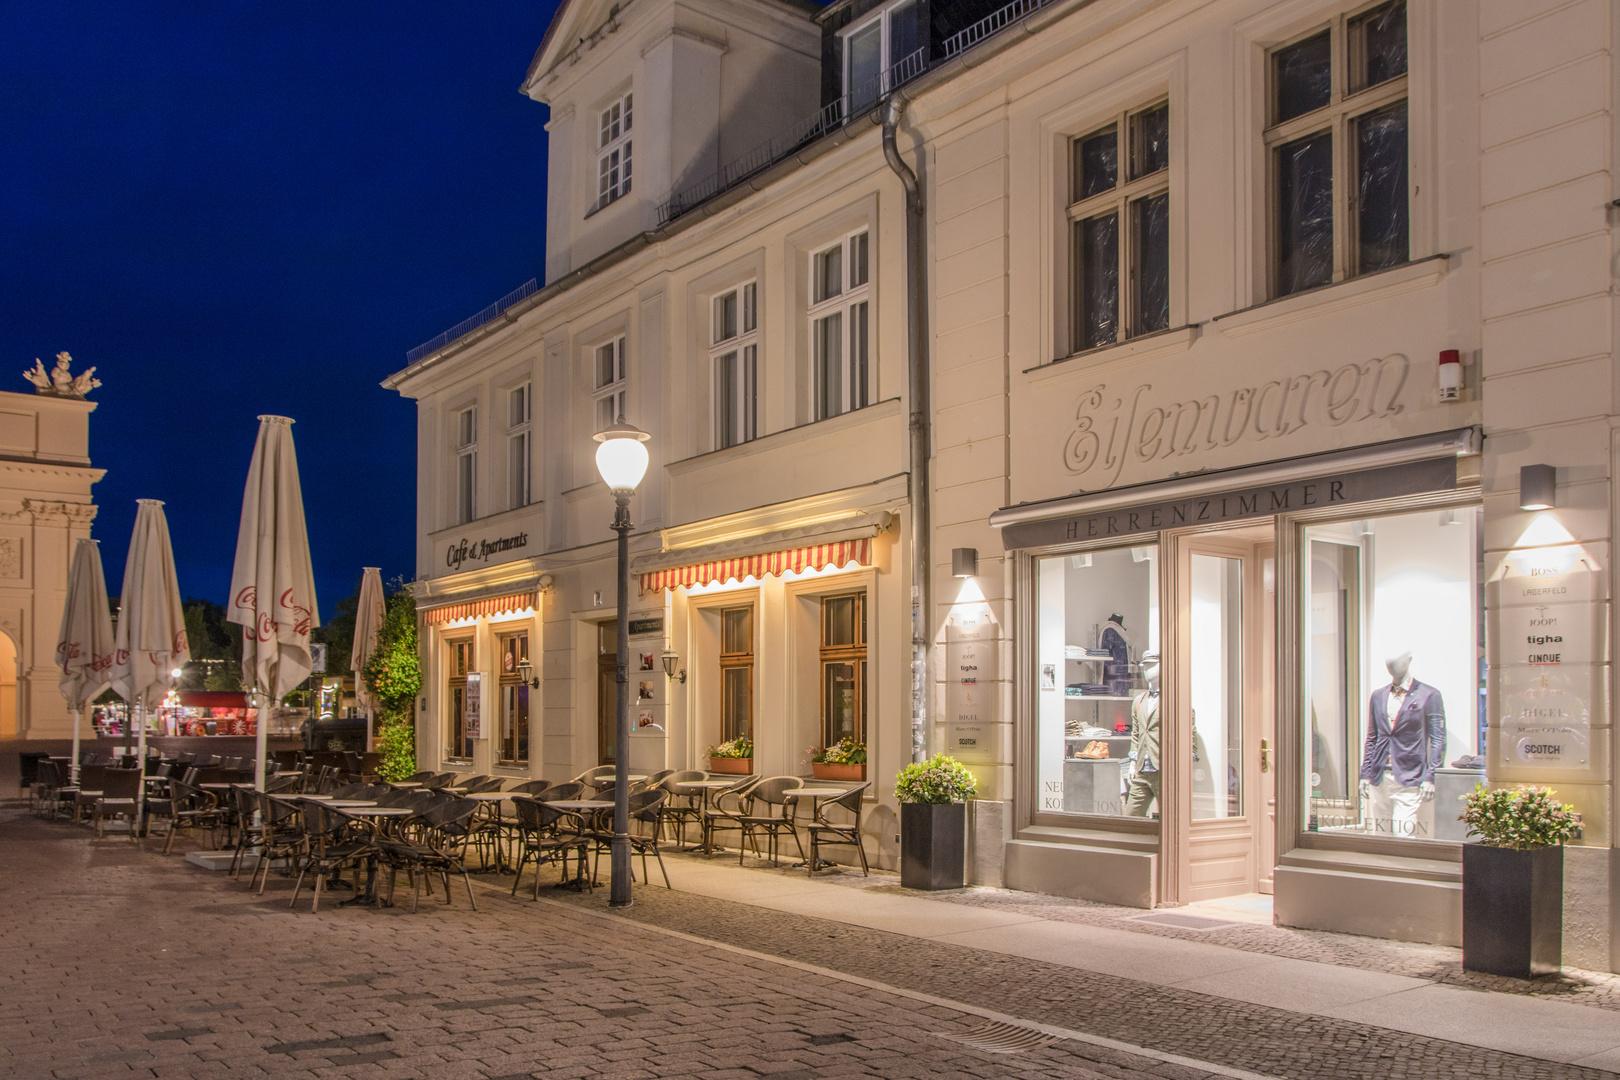 Potsdam at night